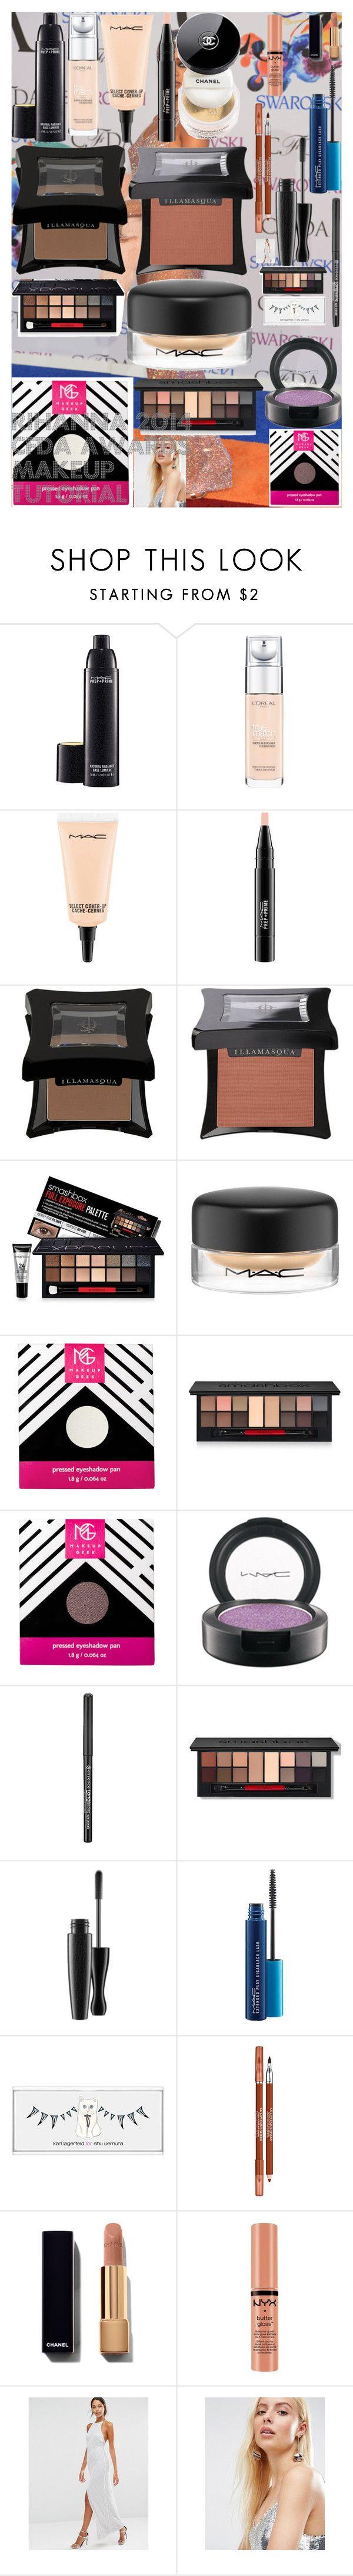 """Rihanna 2014 CFDA Awards Makeup Tutorial"" by oroartye-1 on Polyvore featuring beauty, MAC Cosmetics, L'Oréal Paris, Chanel, Illamasqua, Smashbox, Essence, shu uemura, Lancôme and NYX"